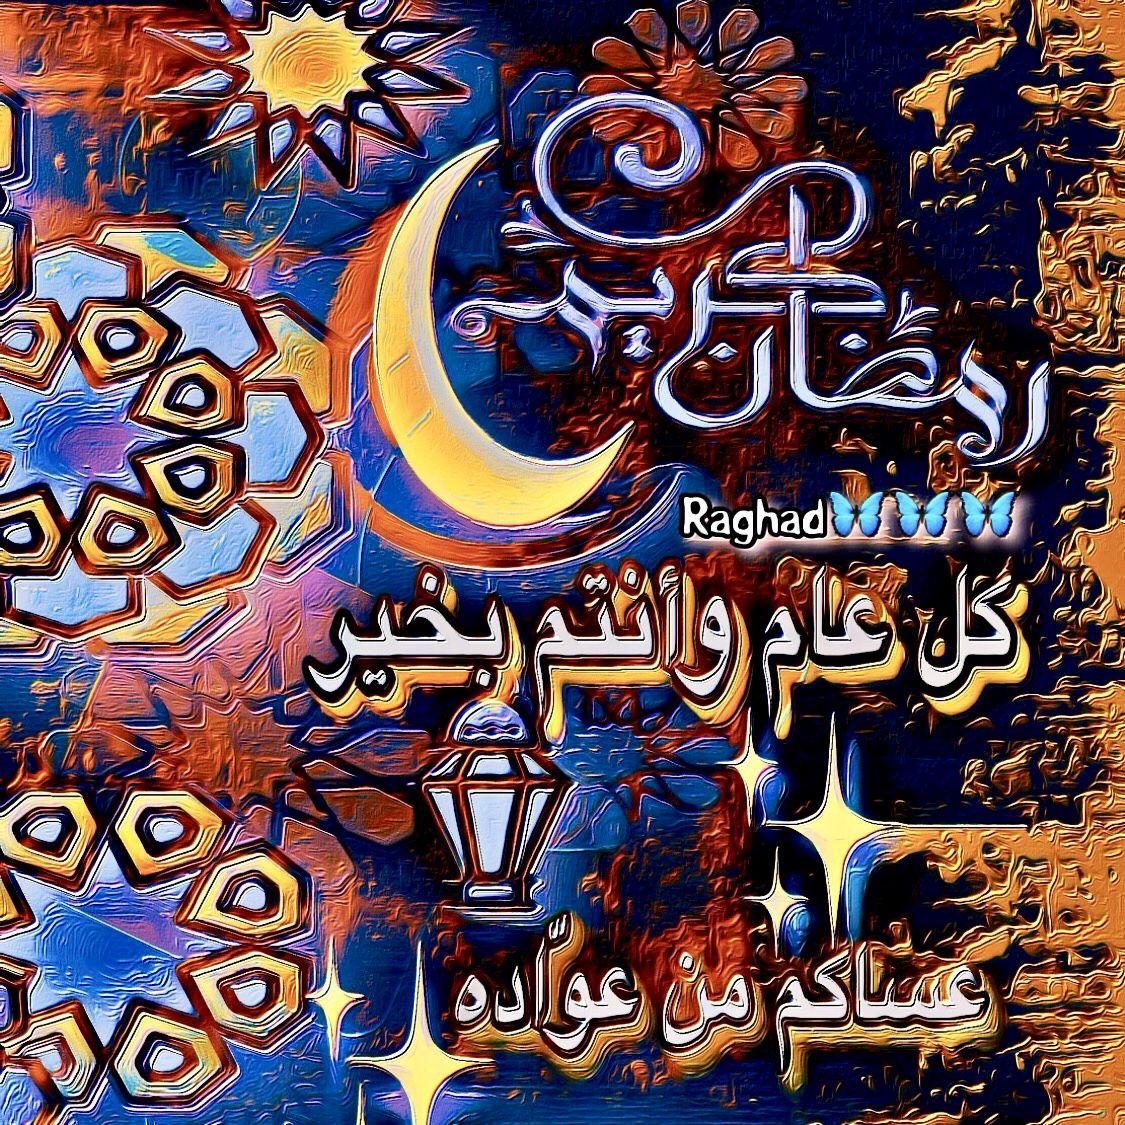 Desertrose الل هم رب اجعل شهر رمضان المبارك ميلاد ا جديد ا لأرواحنا يمحو عنها ما مضى ويبل غها عفوك والرضى Ramadan Kareem Ramadan Neon Signs